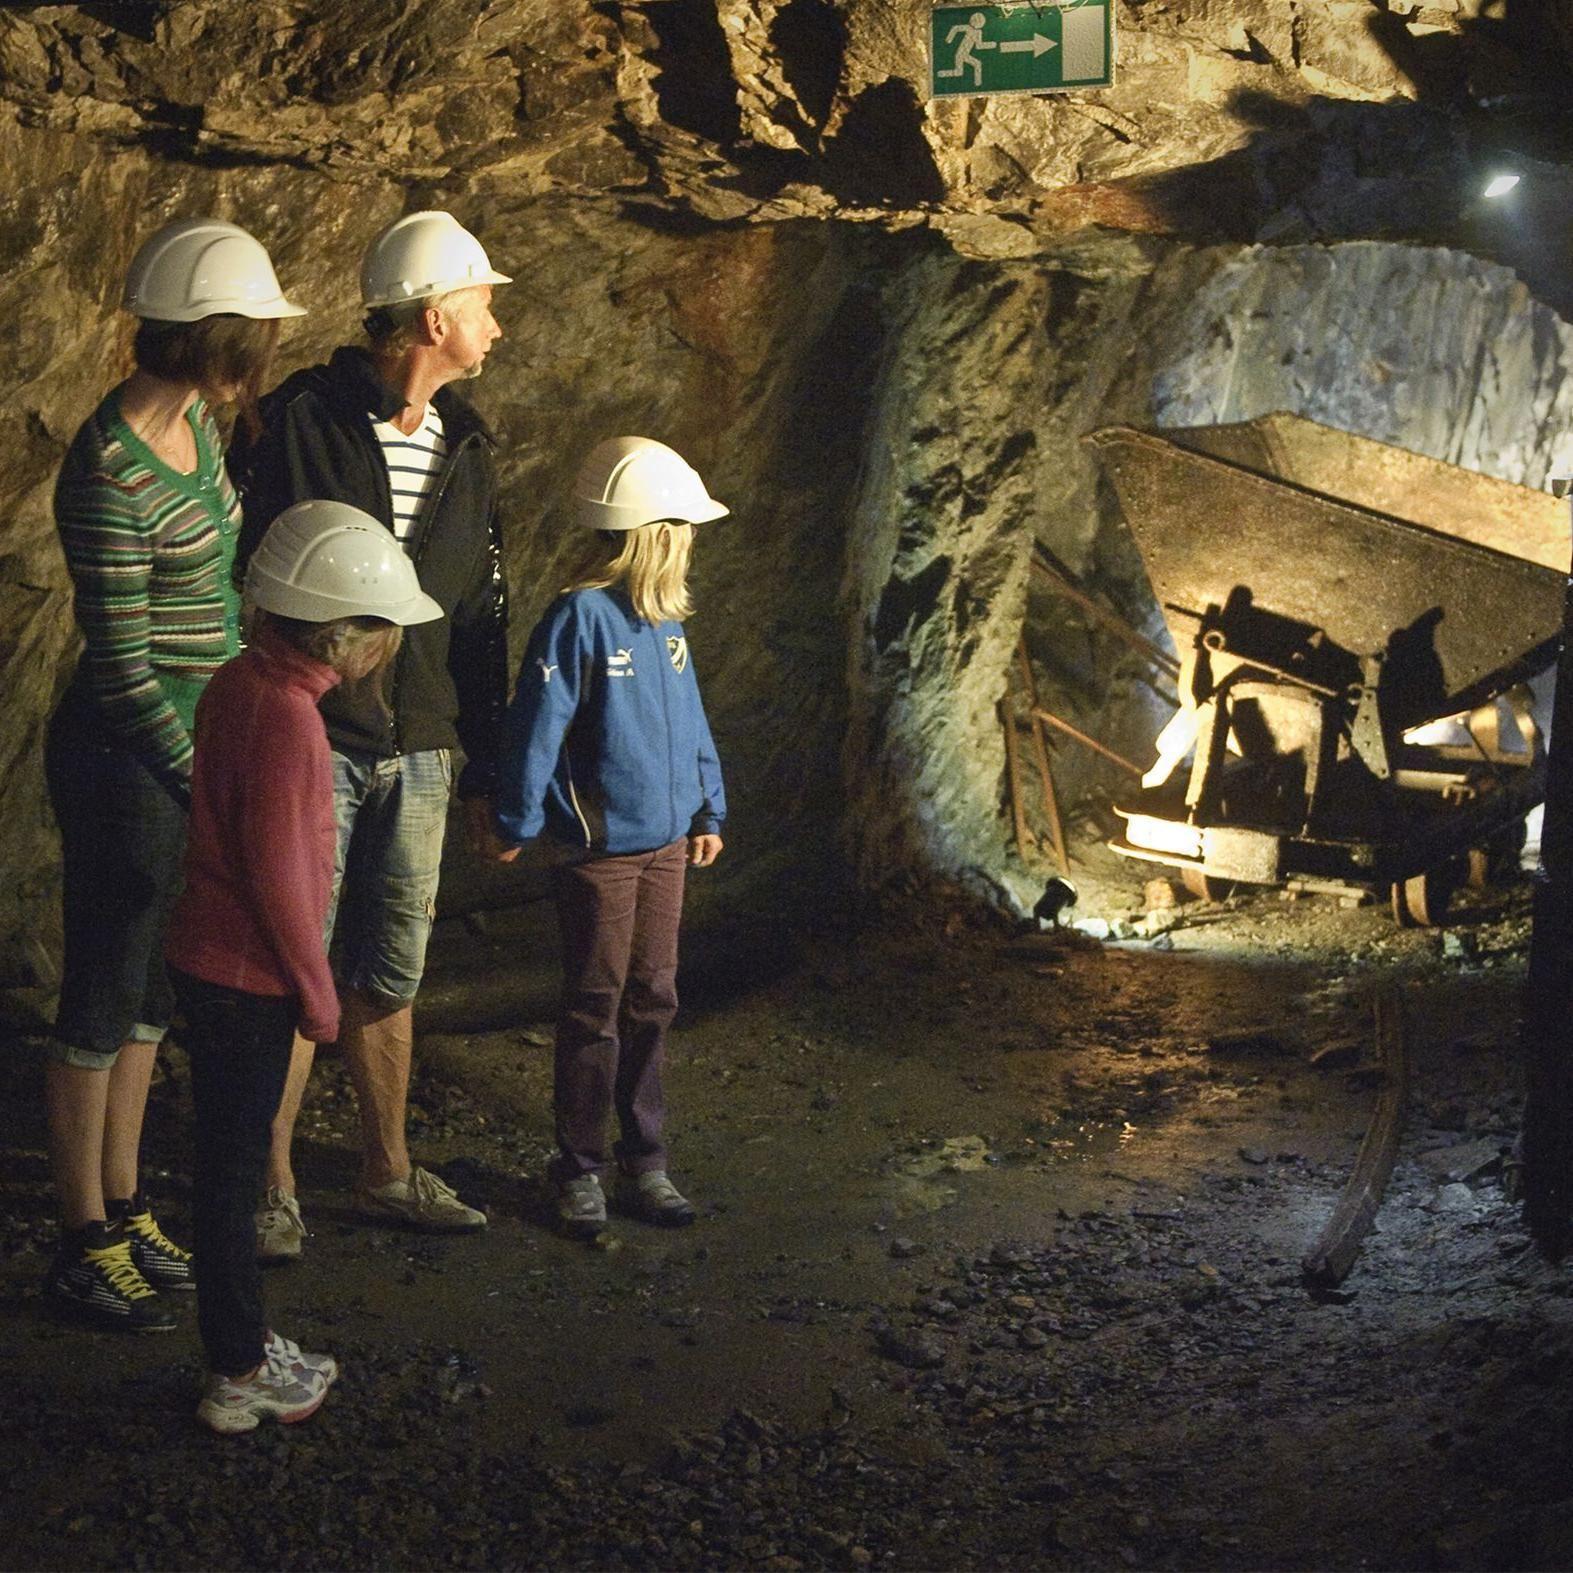 foto: Gomer,  © Copyright, Säsongstart på Flogbergets gruvor